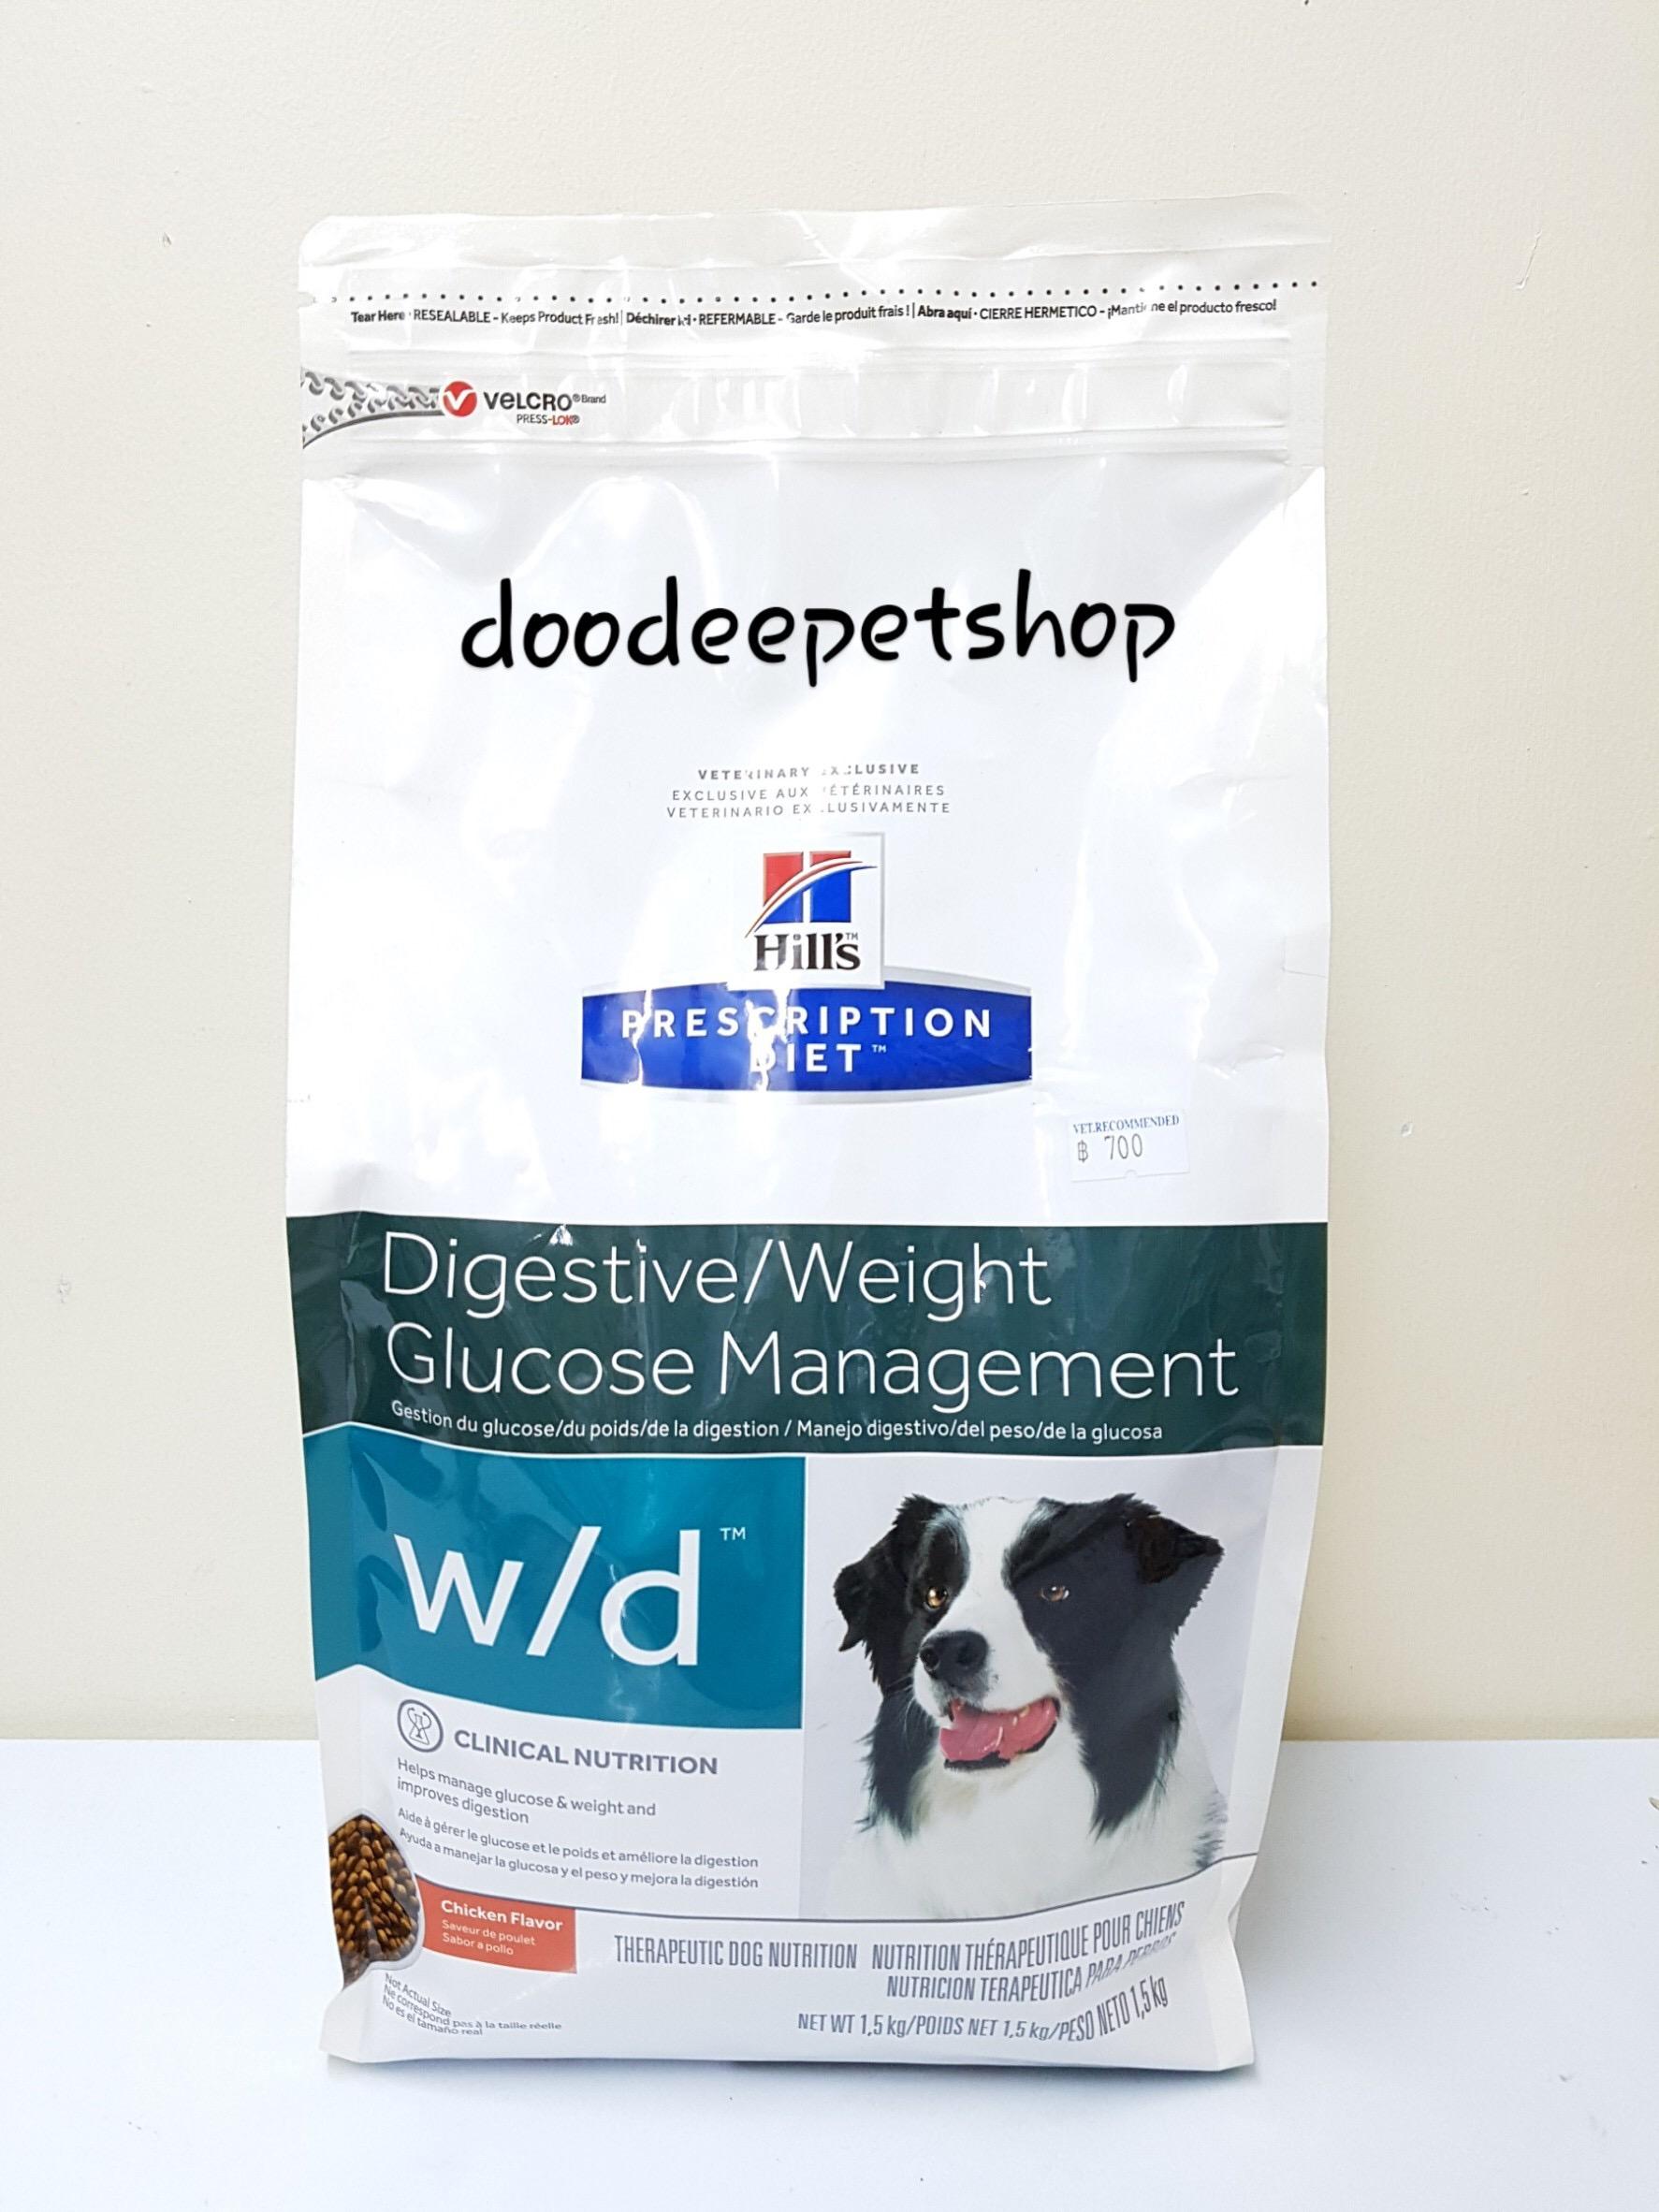 Hill's w/d canine สำหรับโรคเบาหวานและควบคุมน้ำหนัก ขนาด 3.86 kg. Exp.09/18